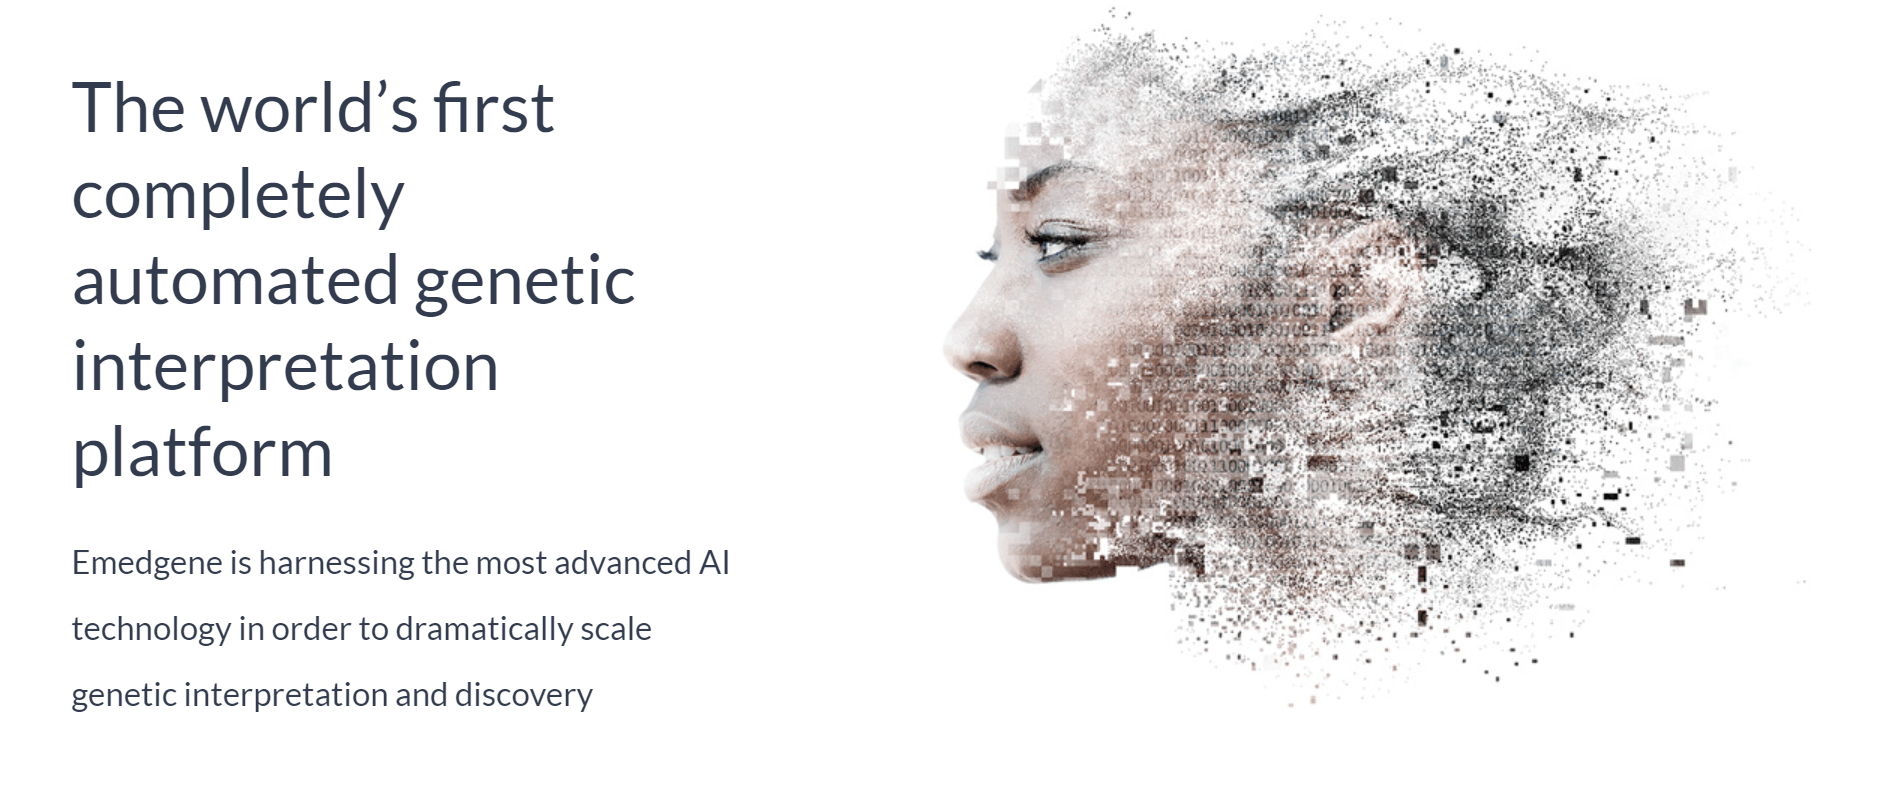 Emedgene Lands $6M to Expand AI-Driven Genomics Interpretation Platform